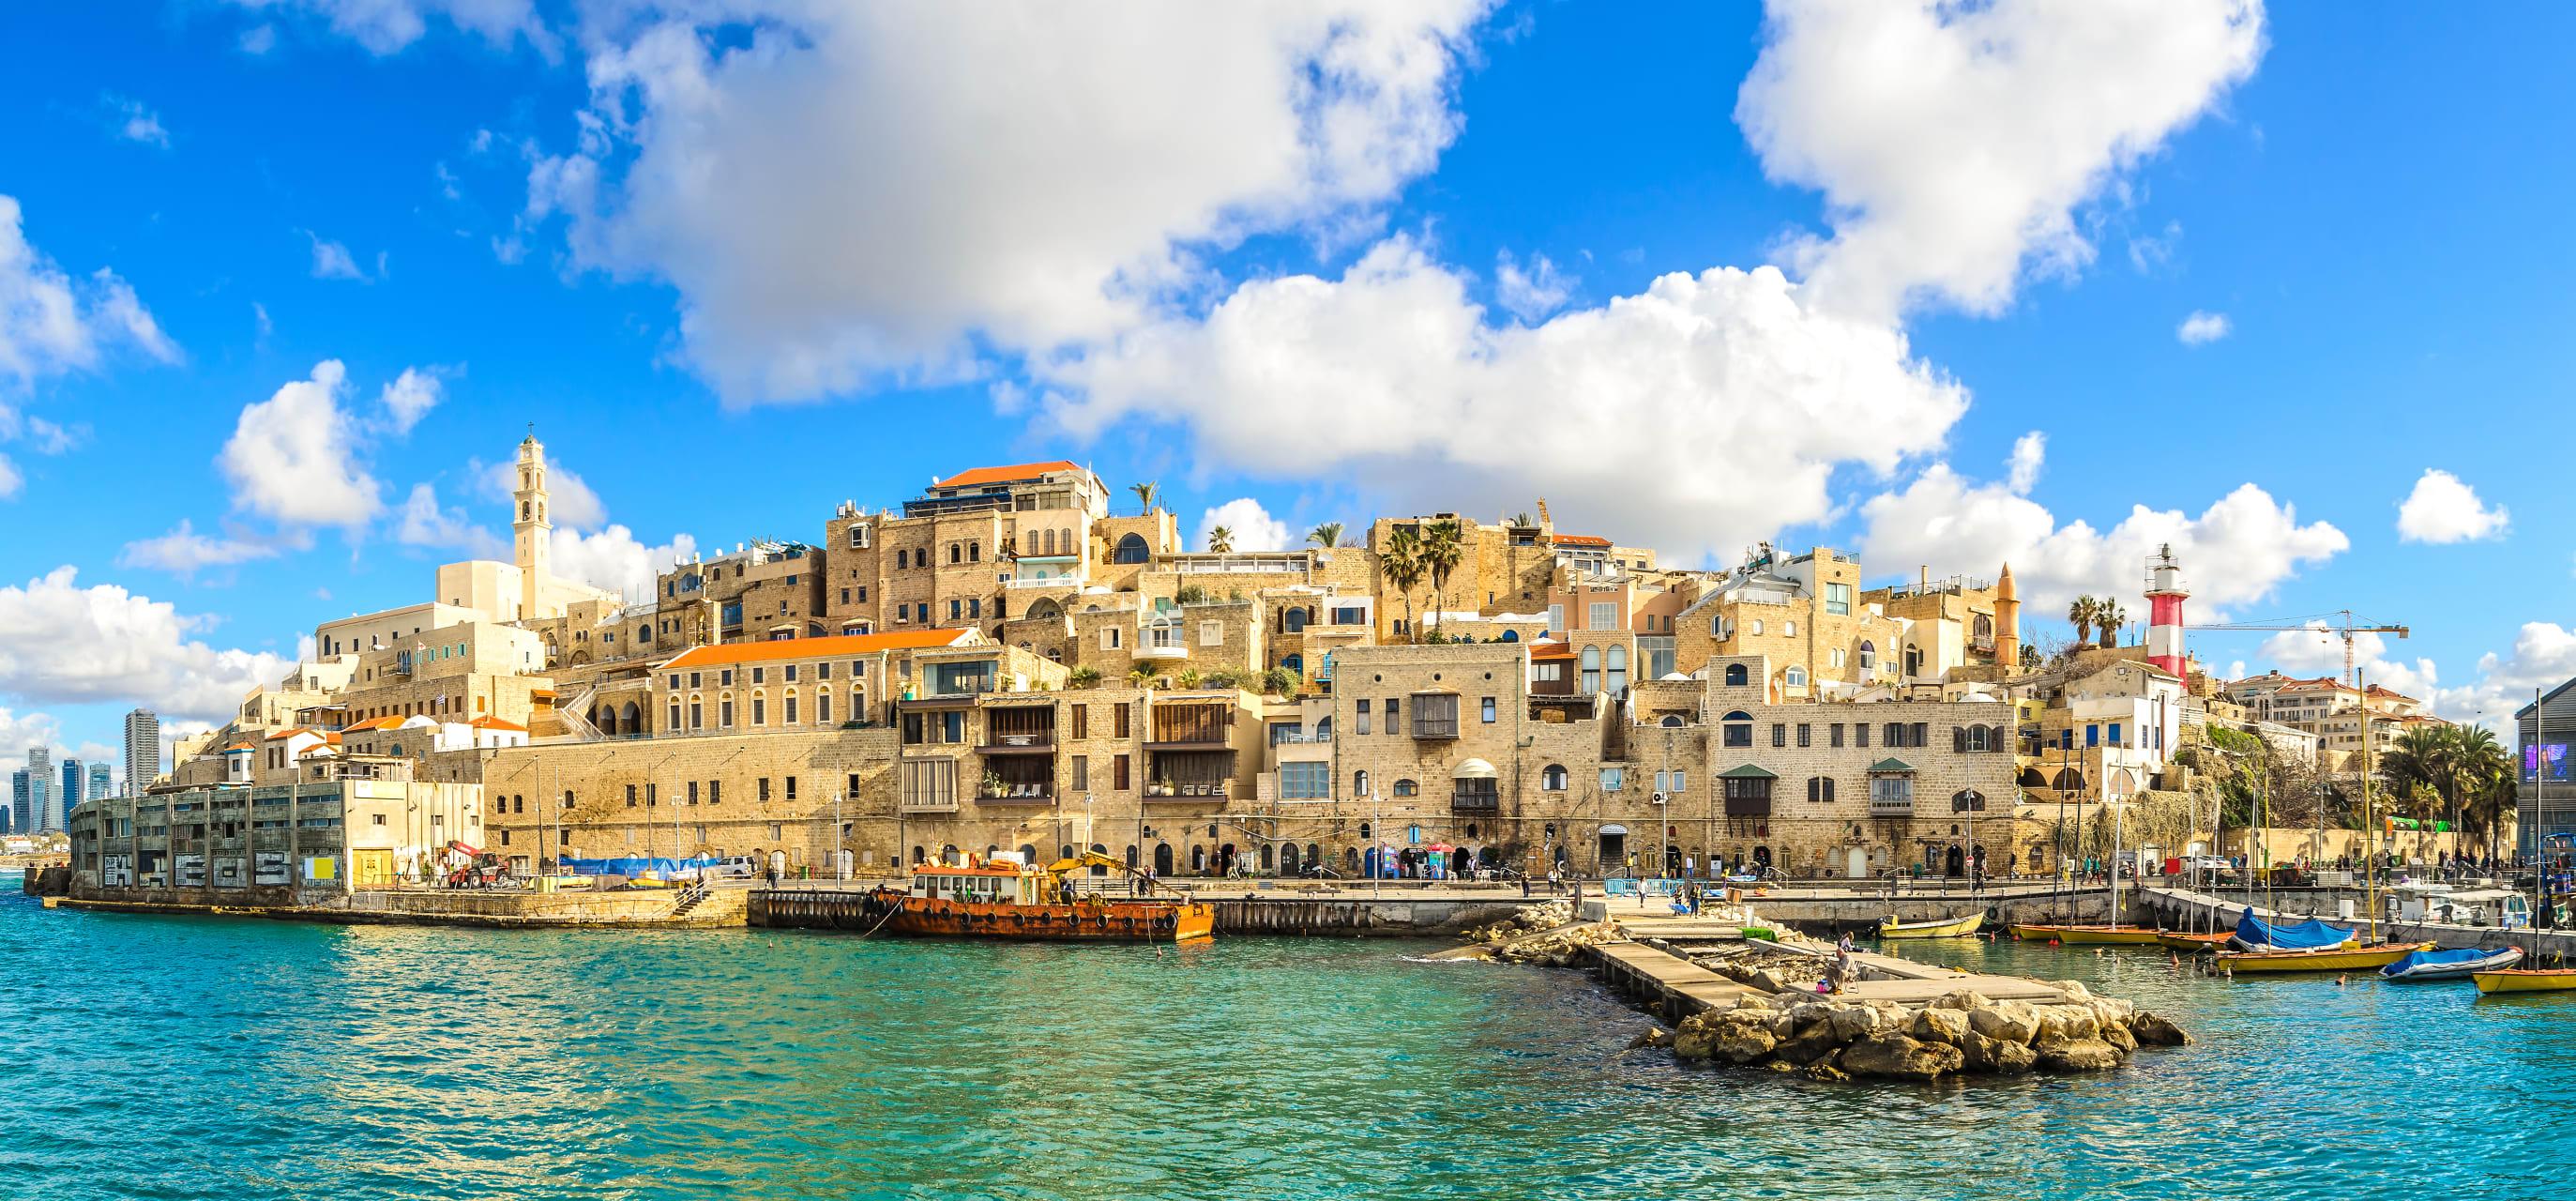 Tel Aviv - By Popular Demand: Ancient Jaffa